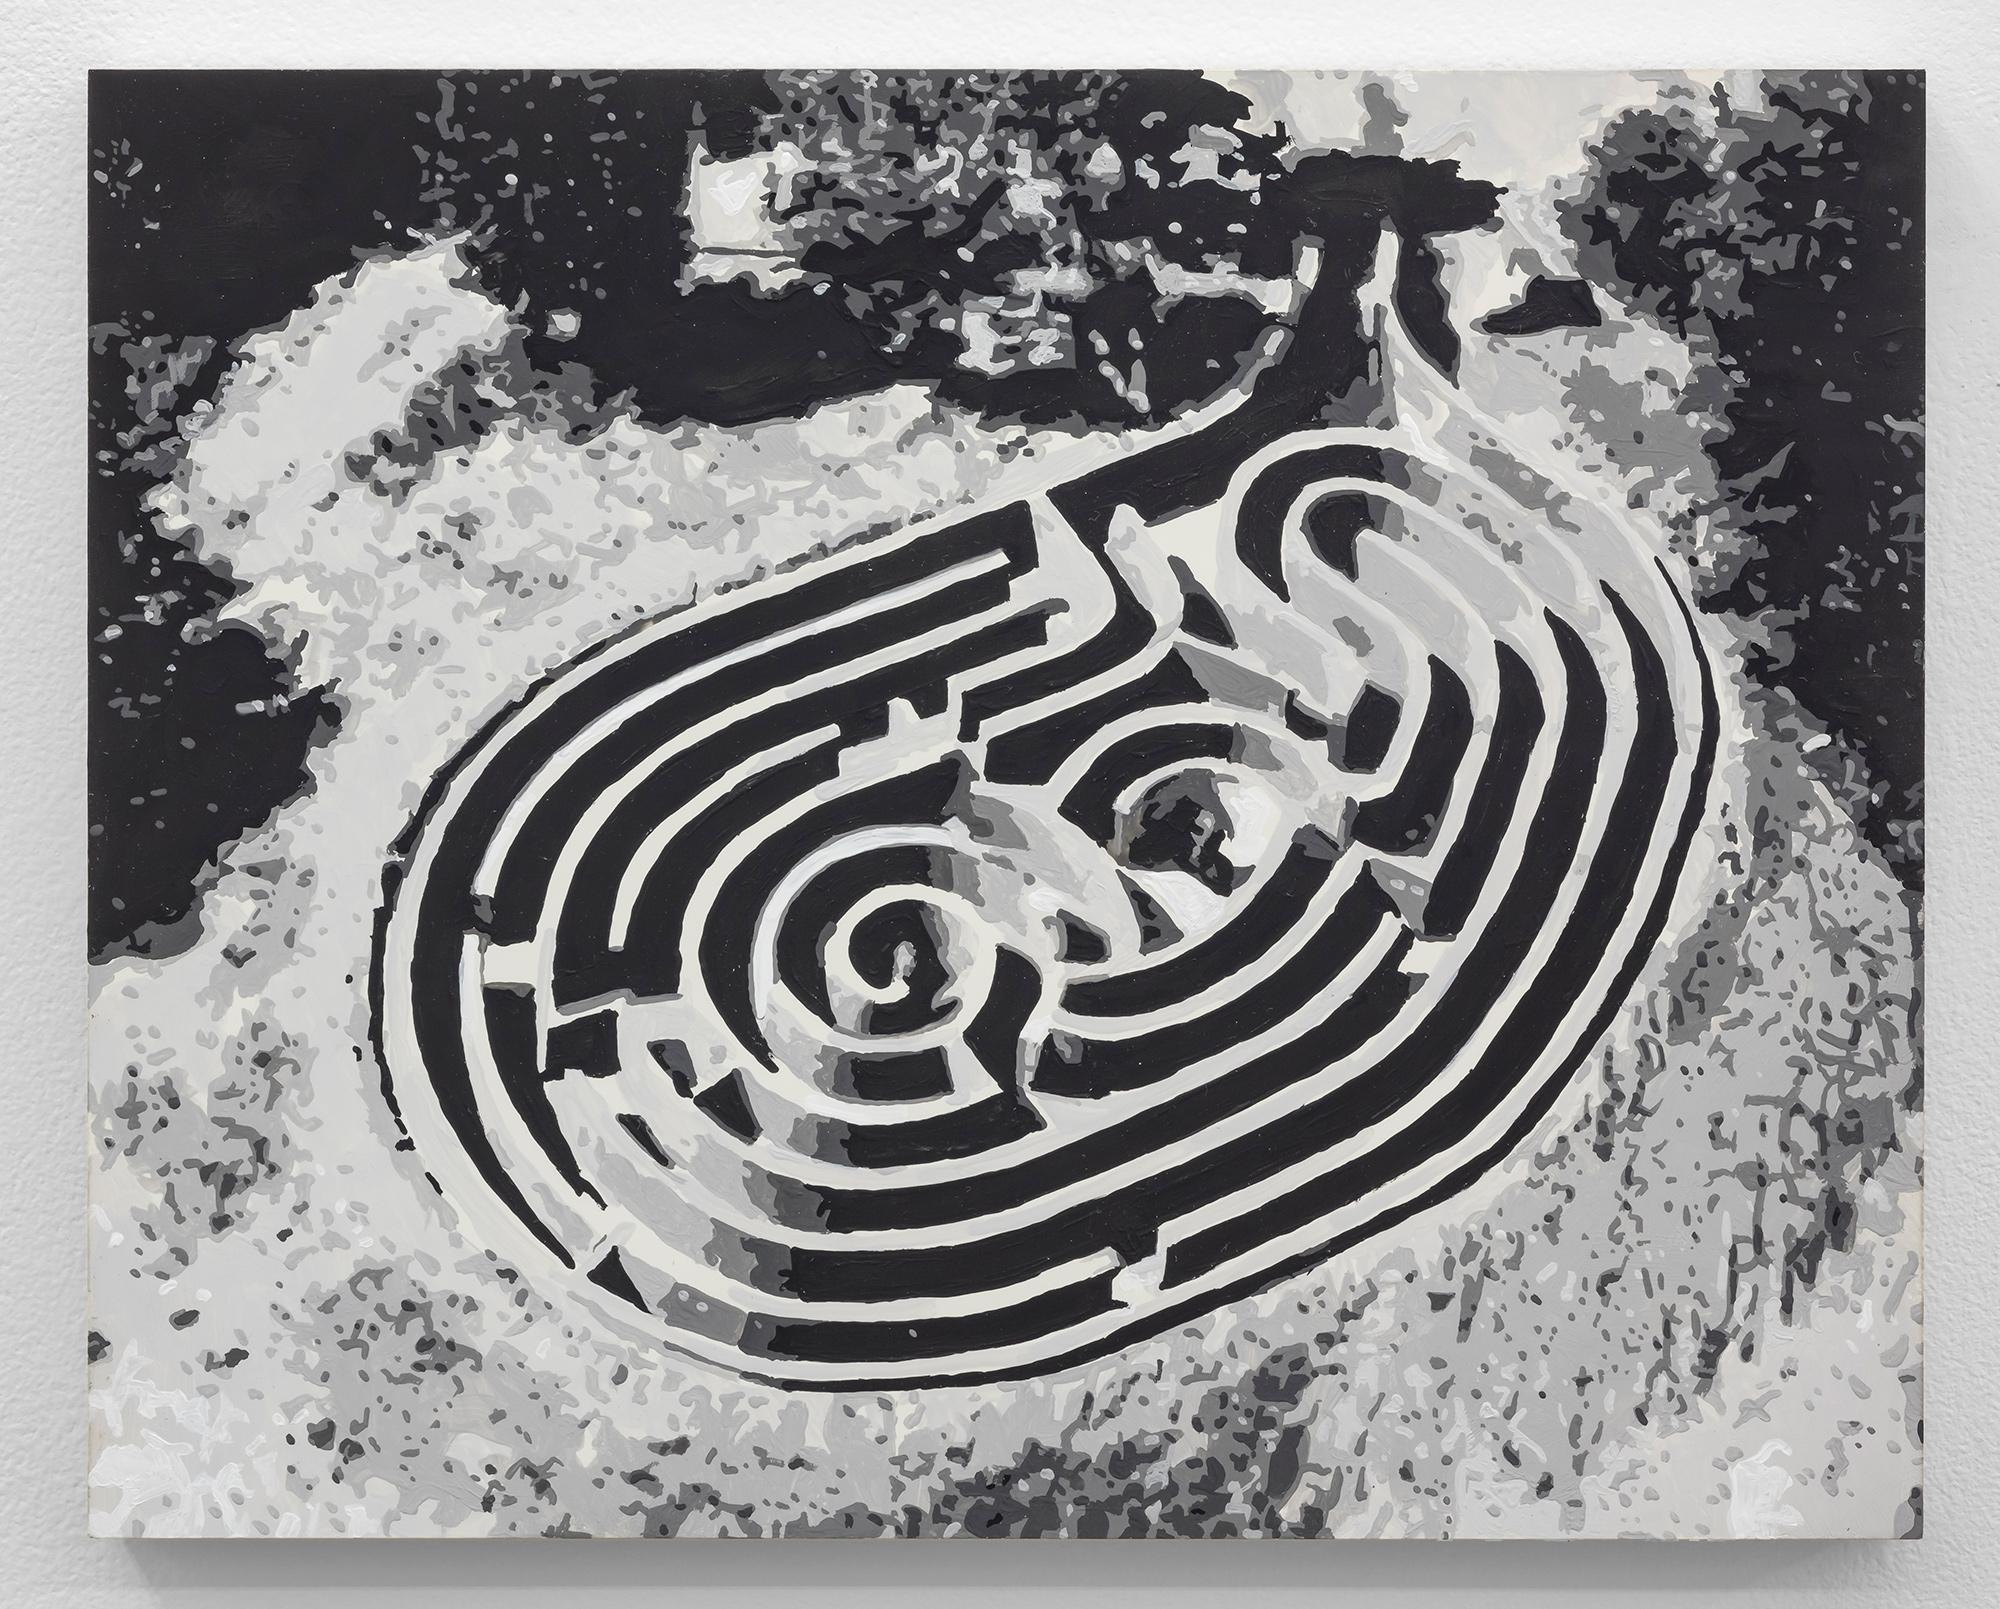 Dorian FitzGerald,  The Maze, Armand G. Erpf Estate, Arkville, New York   2019, holbein acryla gouache on board, 8 x 10 inches